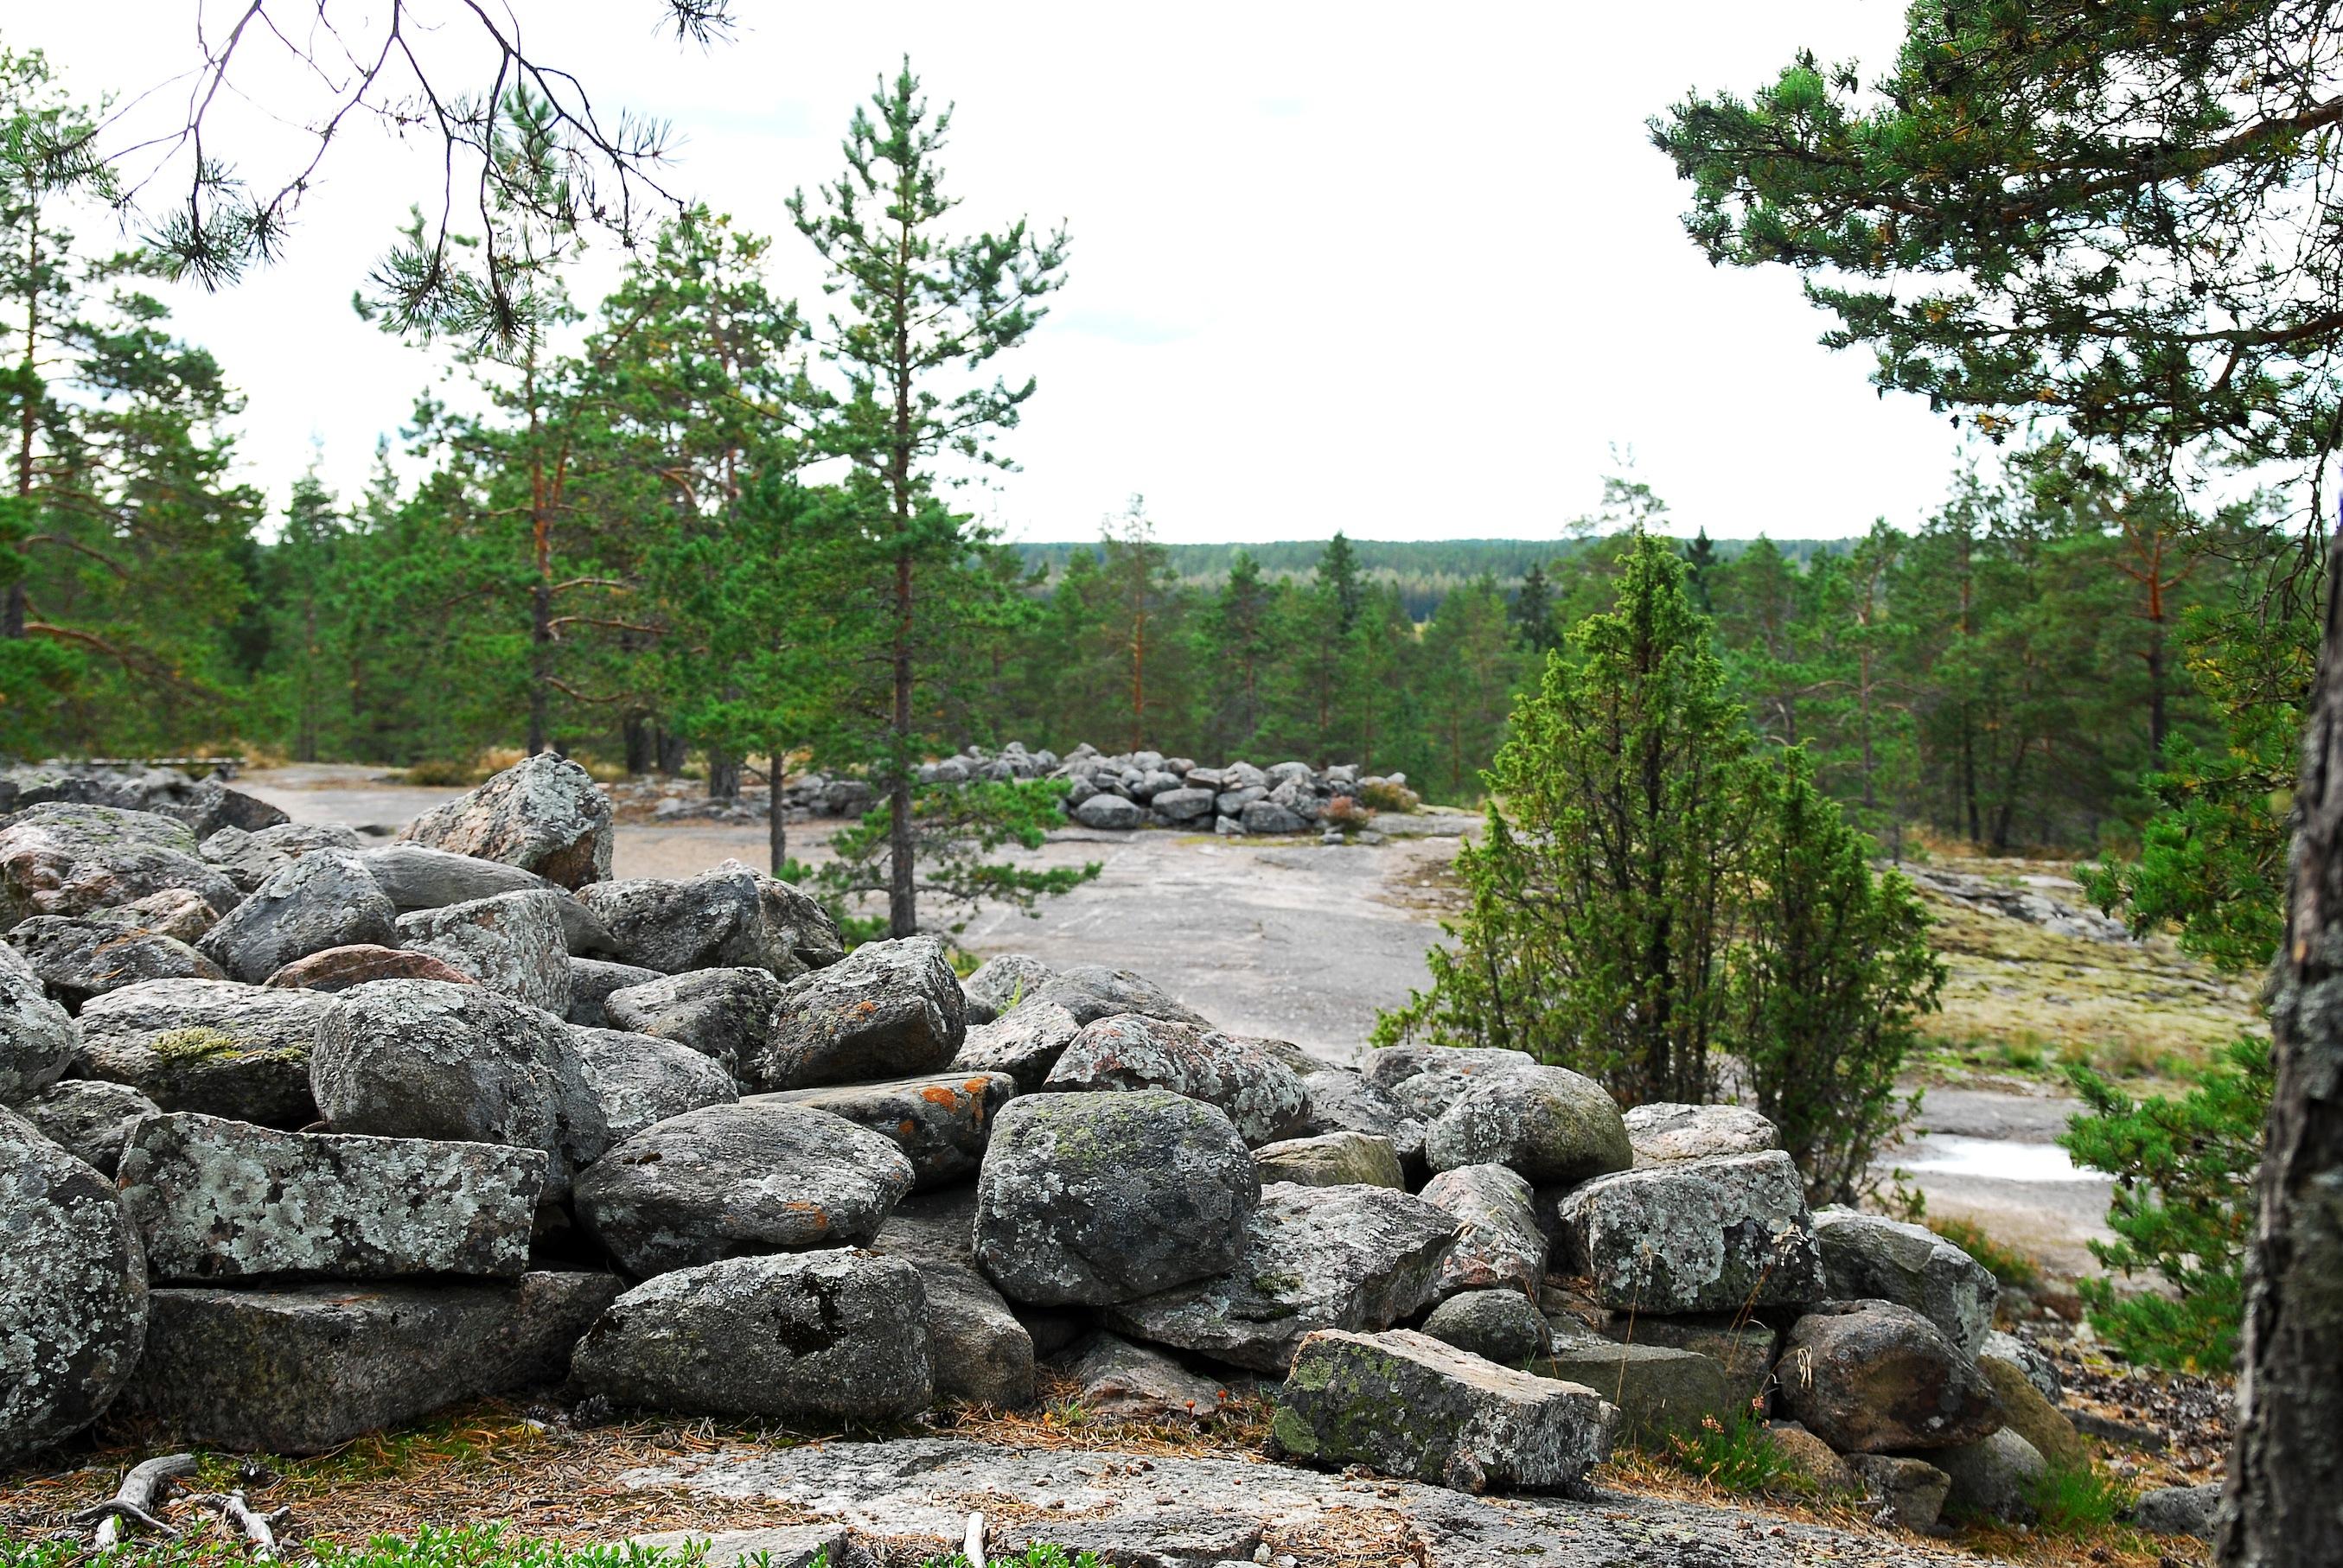 Sammallahdenmaki_city of Rauma - Finland